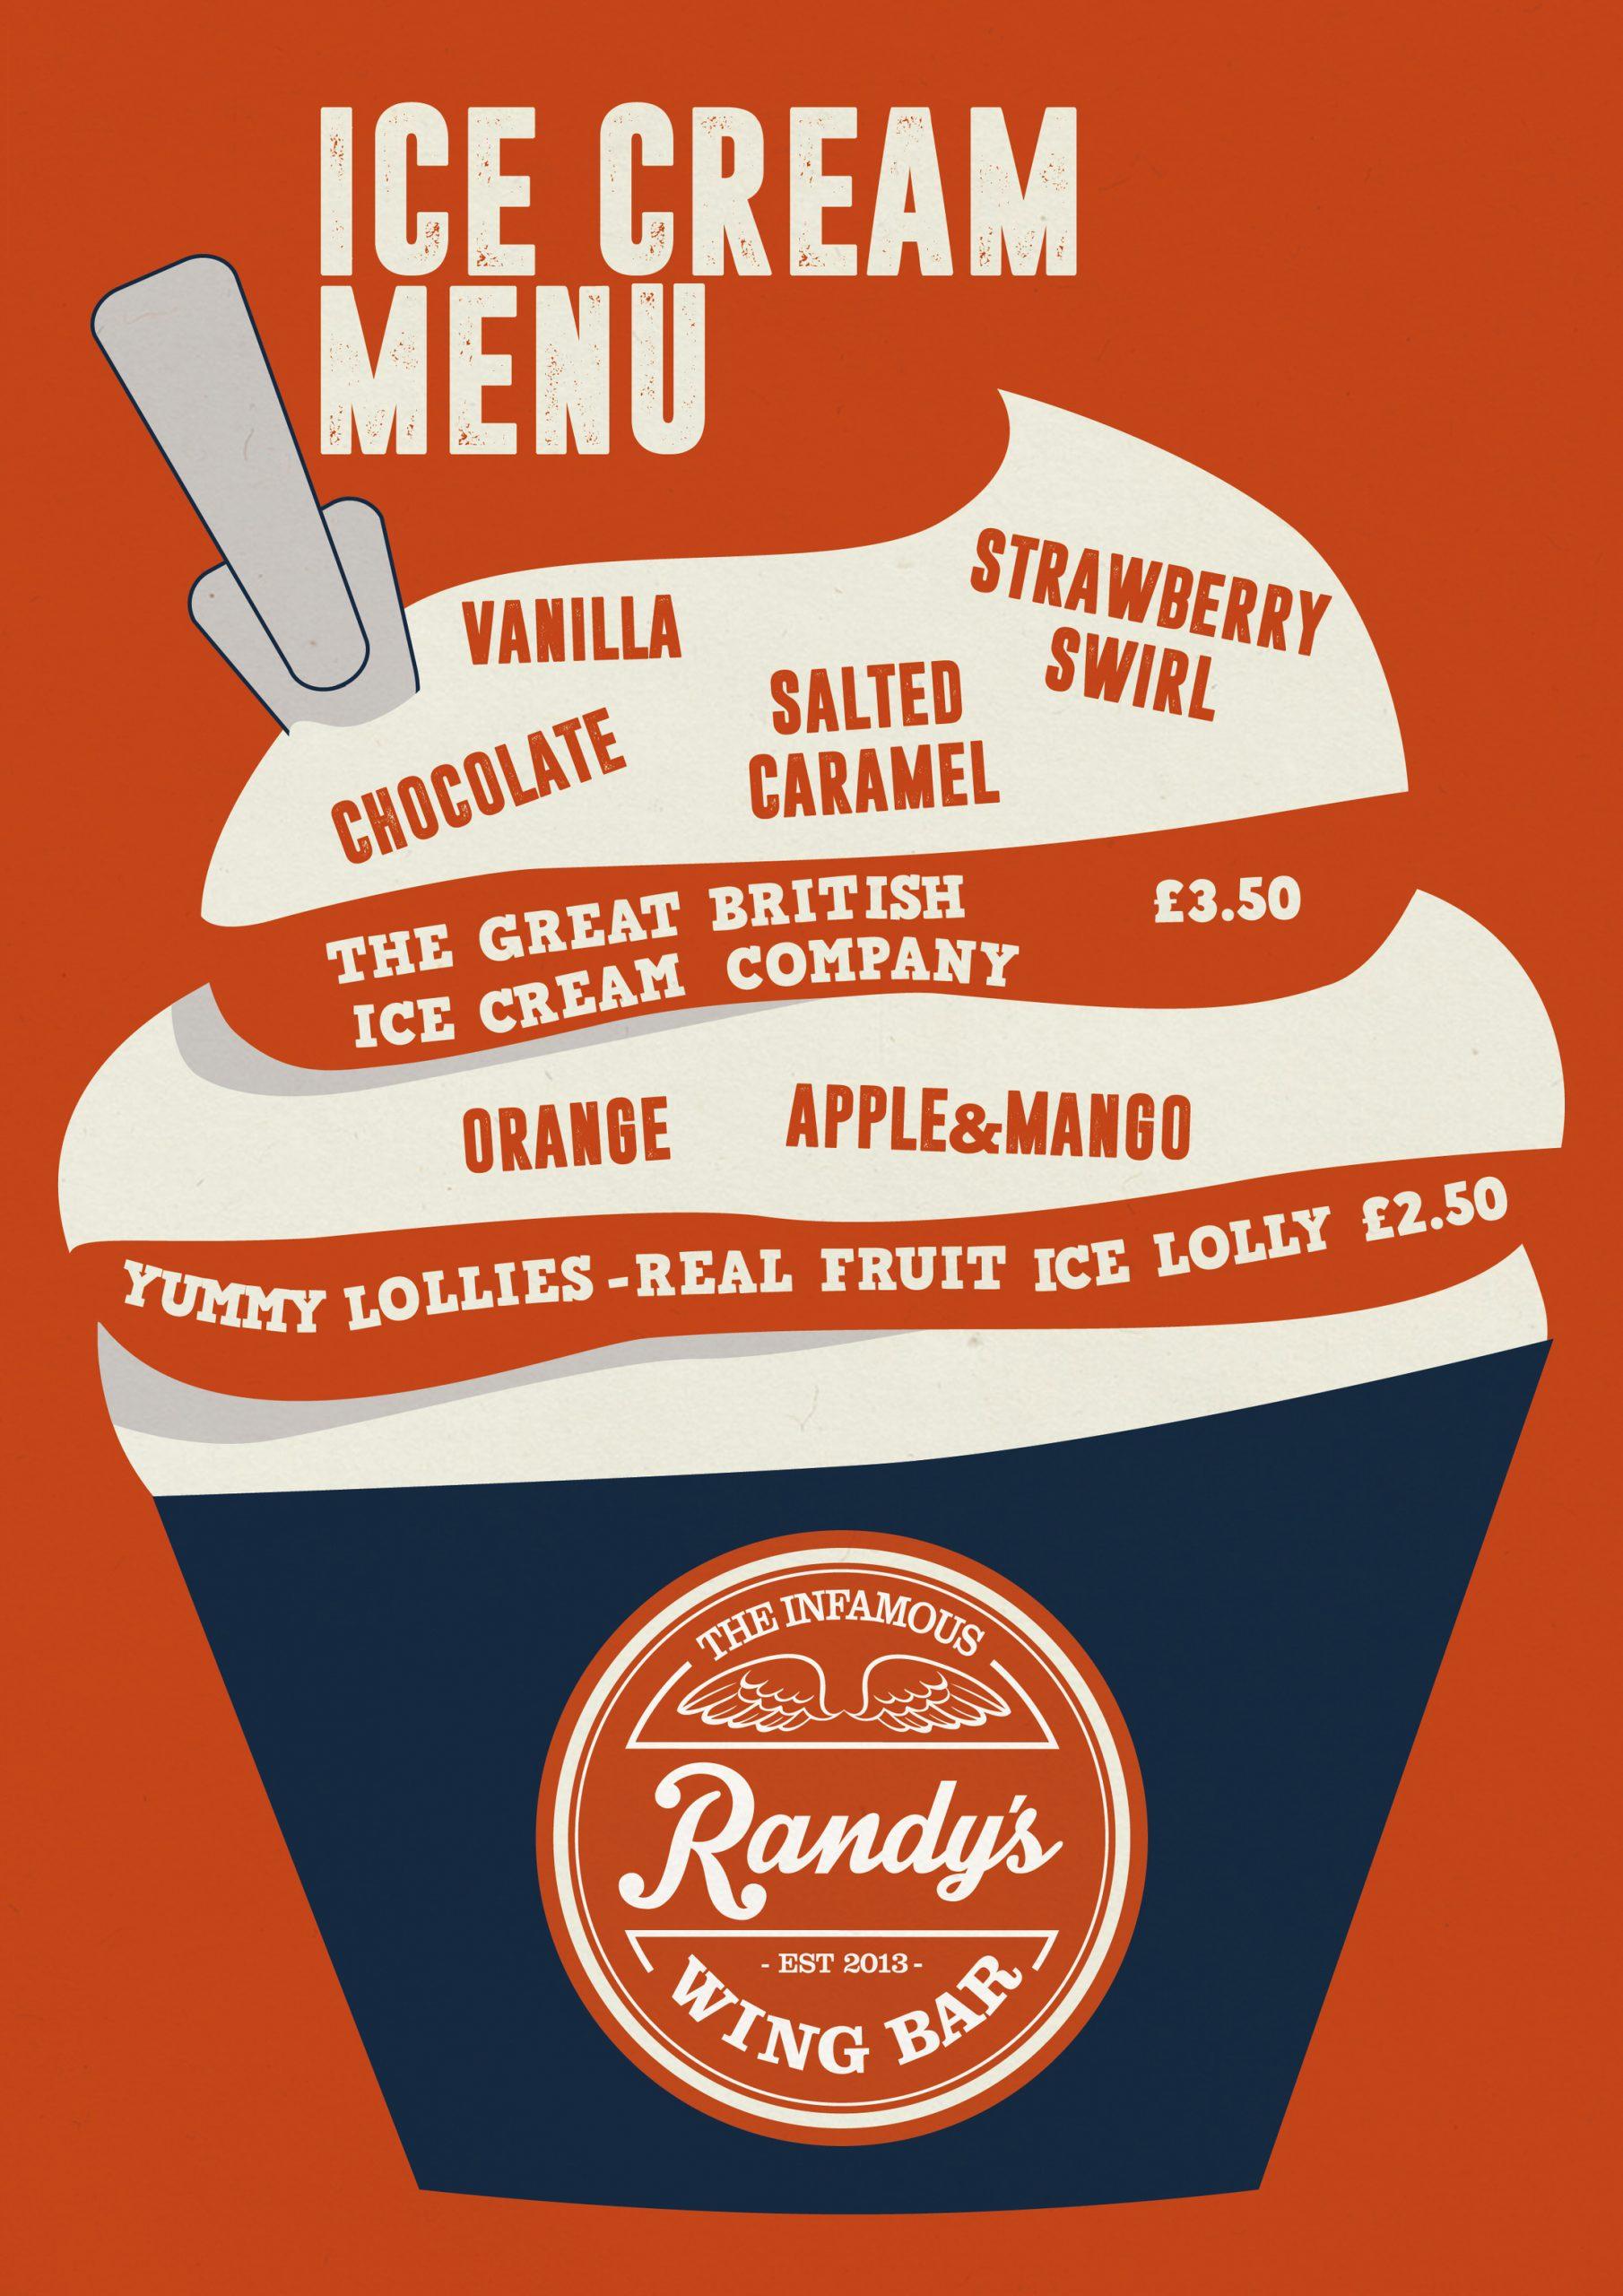 Randy's wing bar Takeaway Icecream Menu 2020